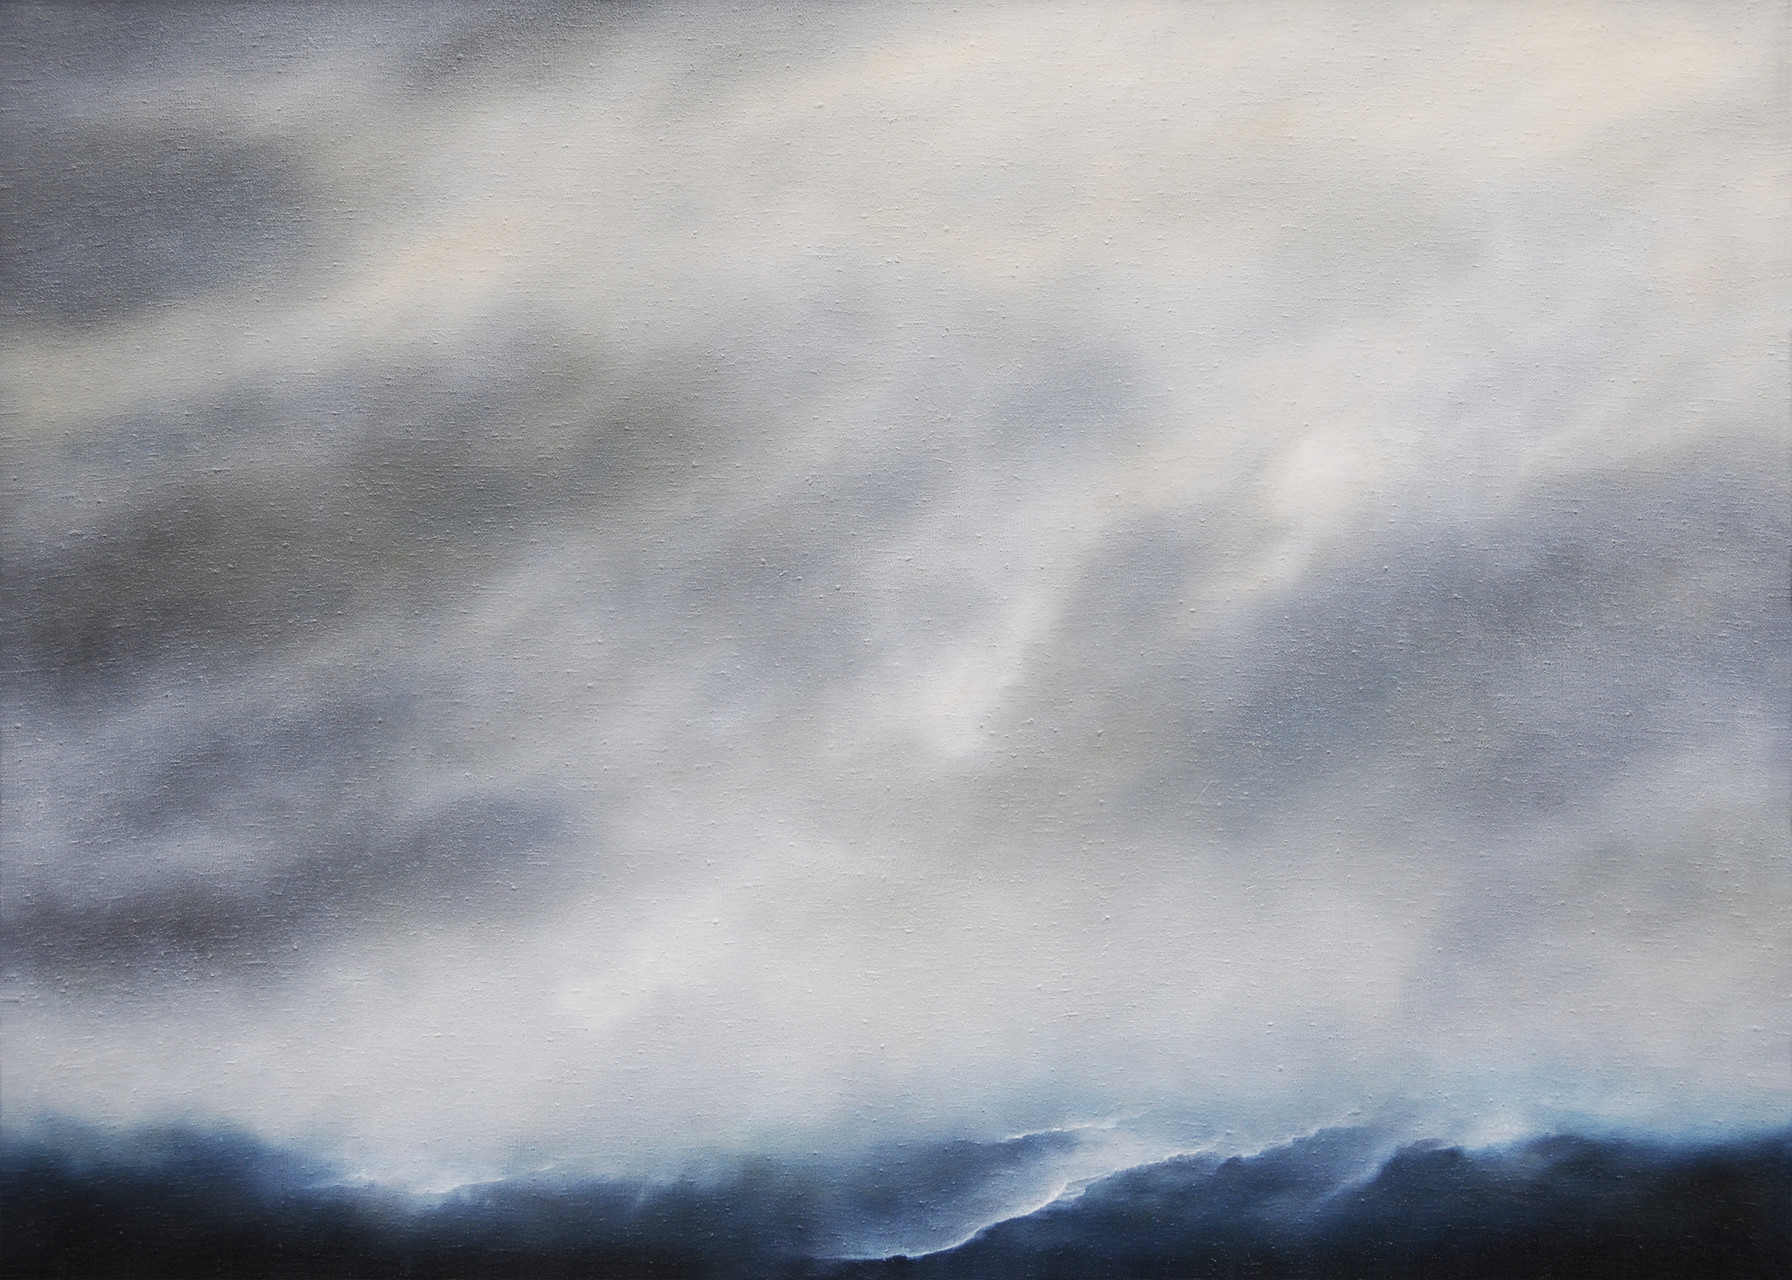 OHNE TITEL, 2015, Öl/Lwd. (grob strukturiert), 100 x 140cm